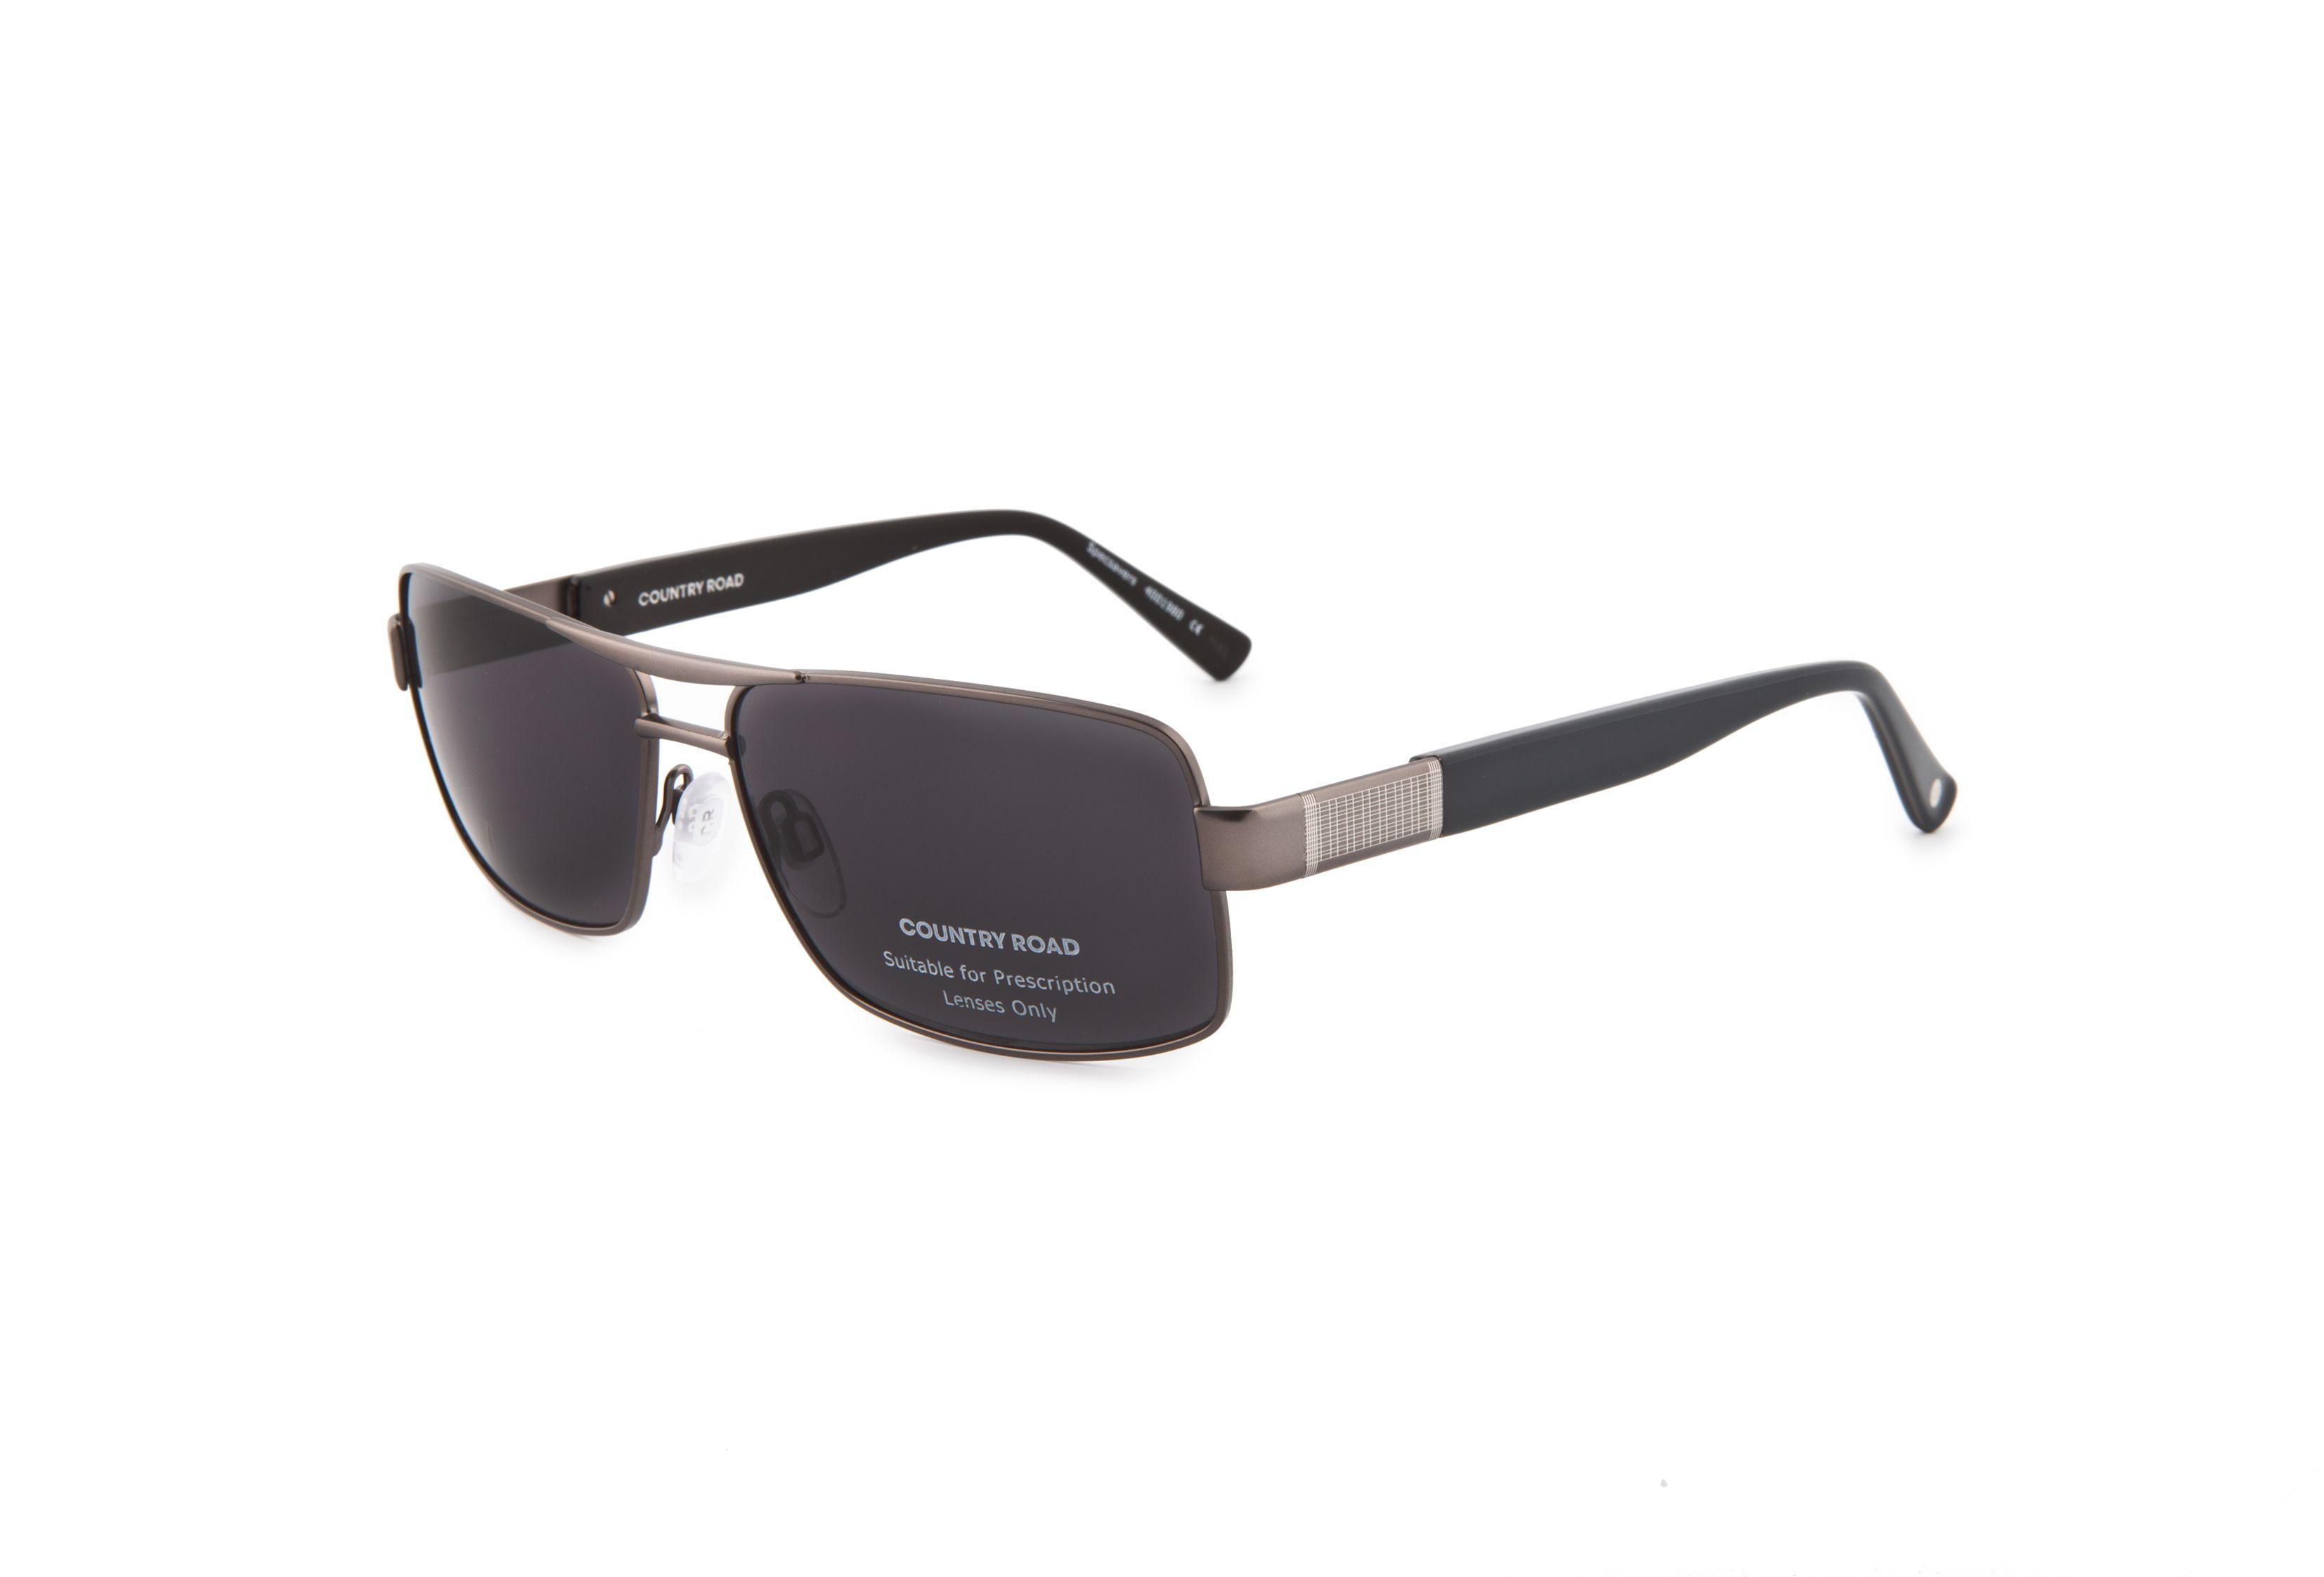 Get a pair of Specsavers prescription sunglasses and a